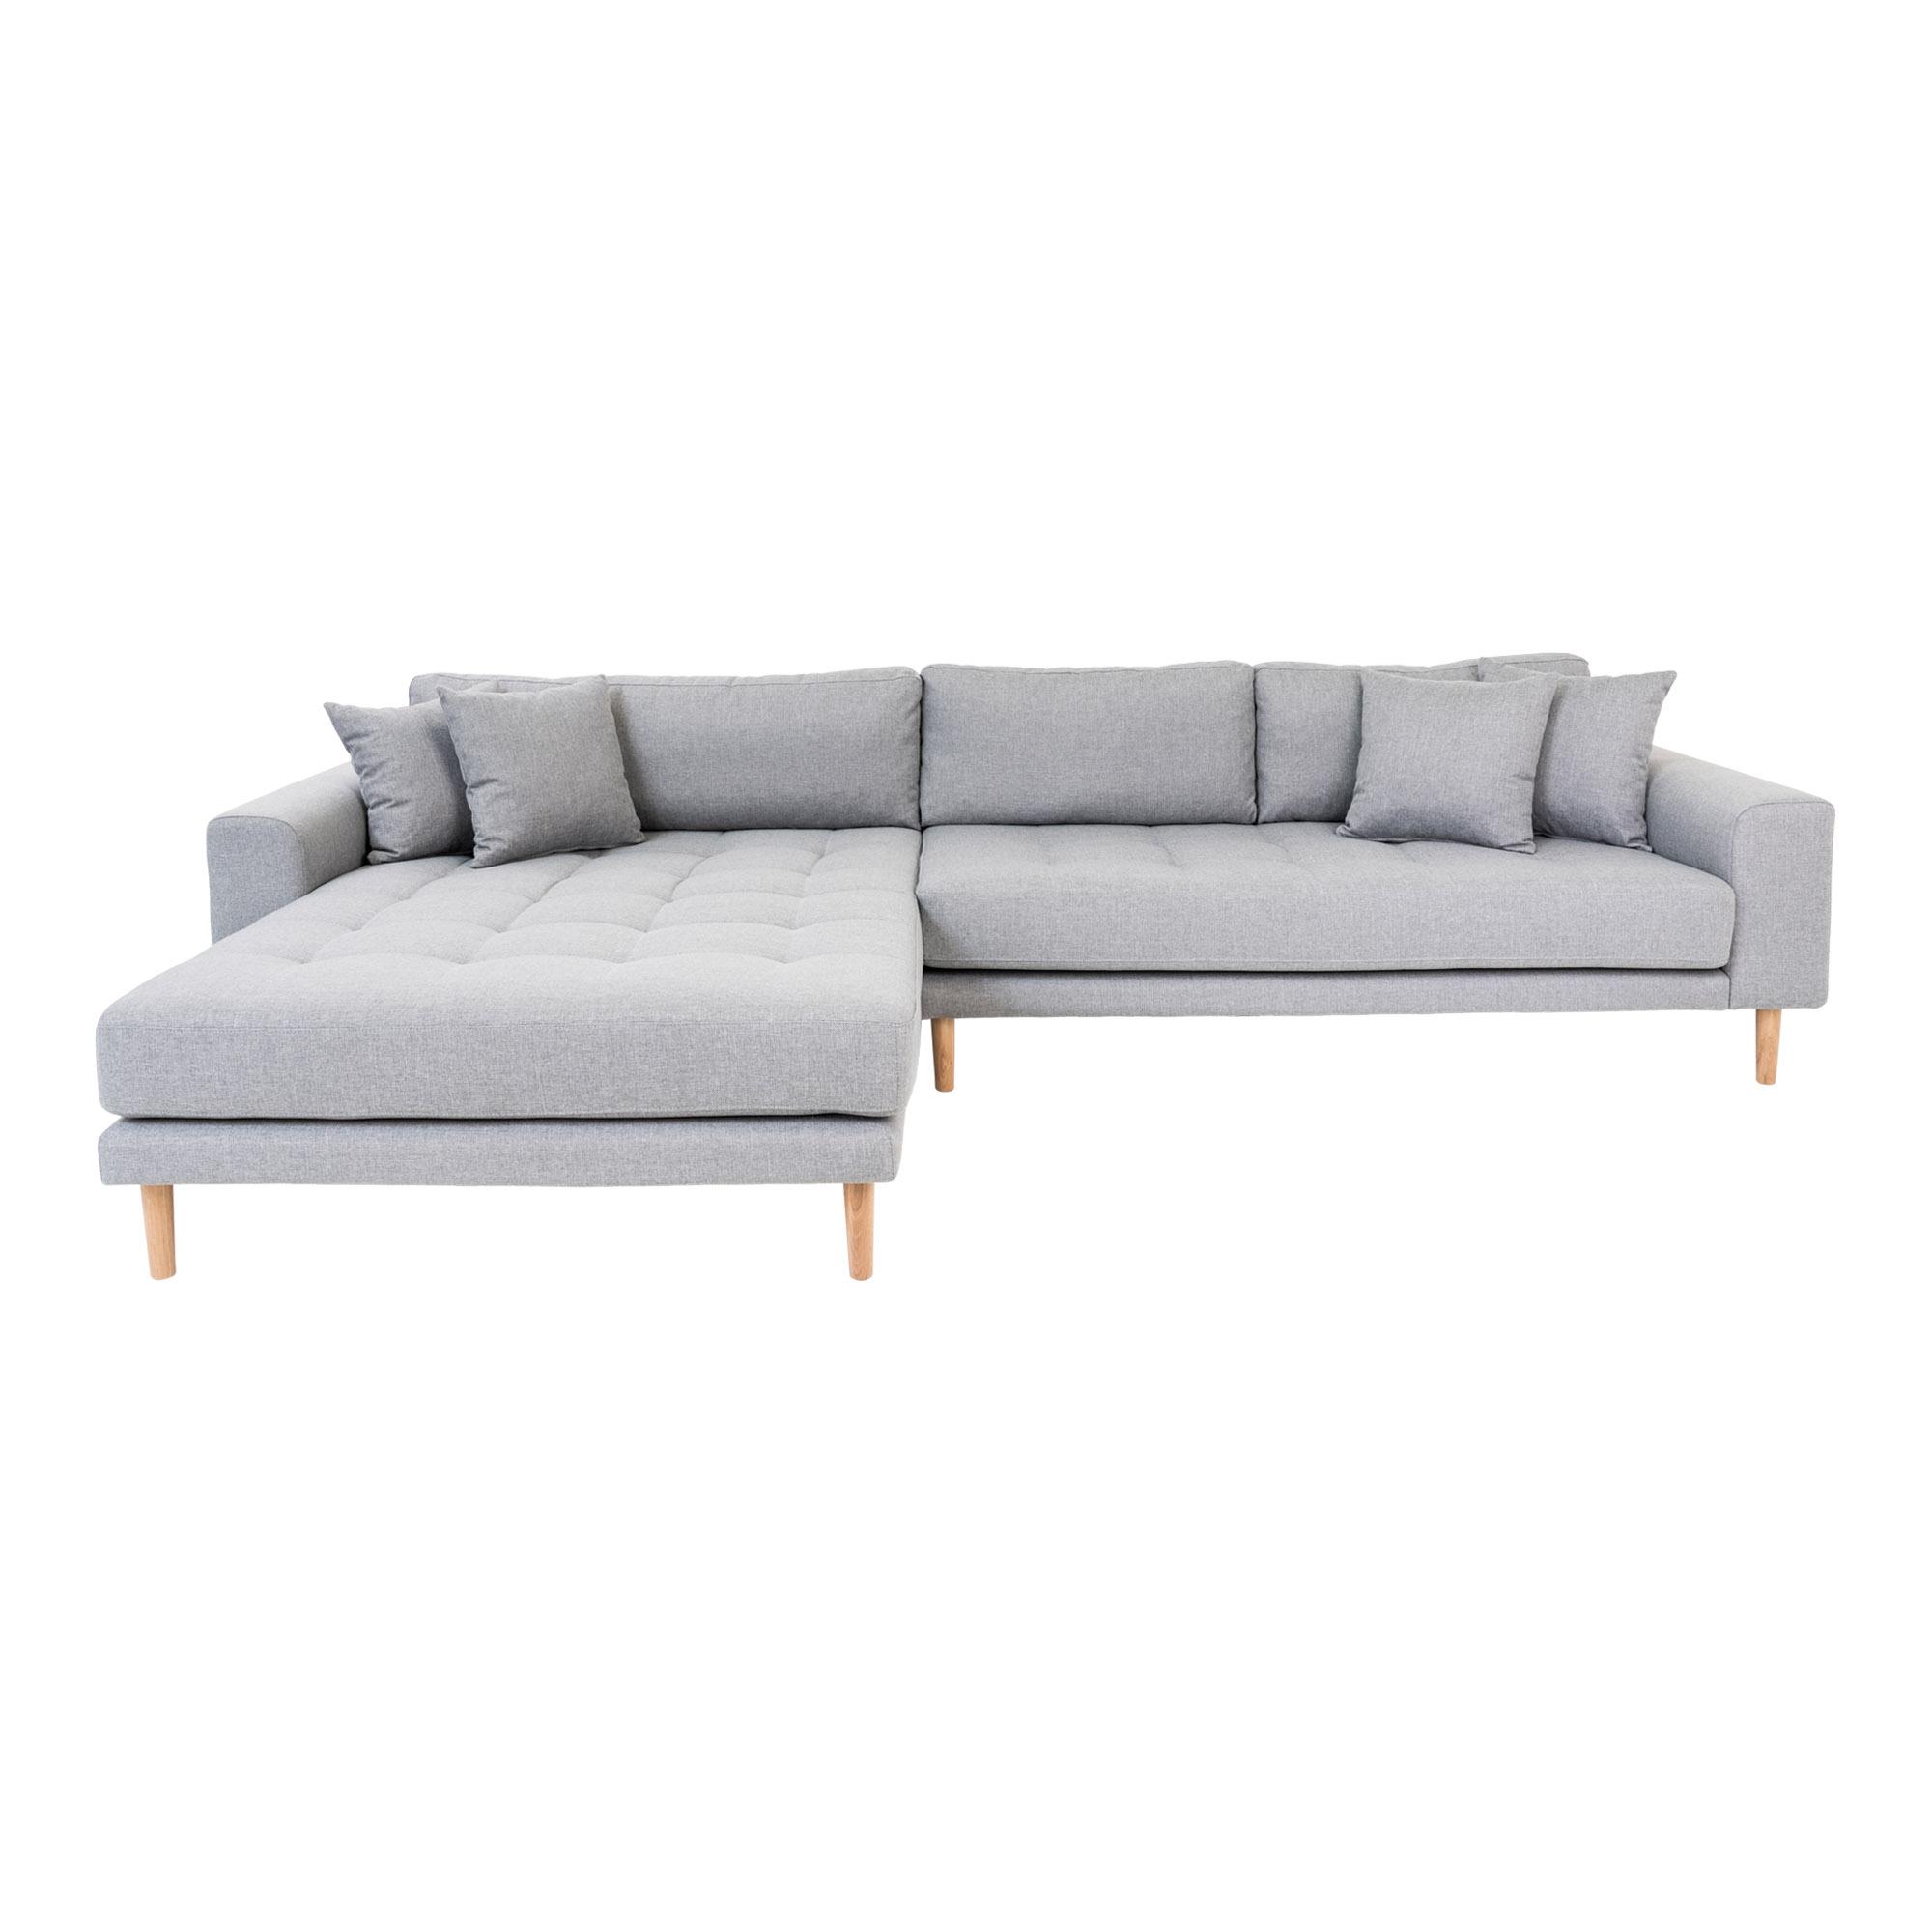 HOUSE NORDIC Lido sofa, m. venstrevendt chaiselong - lysegrå polyester